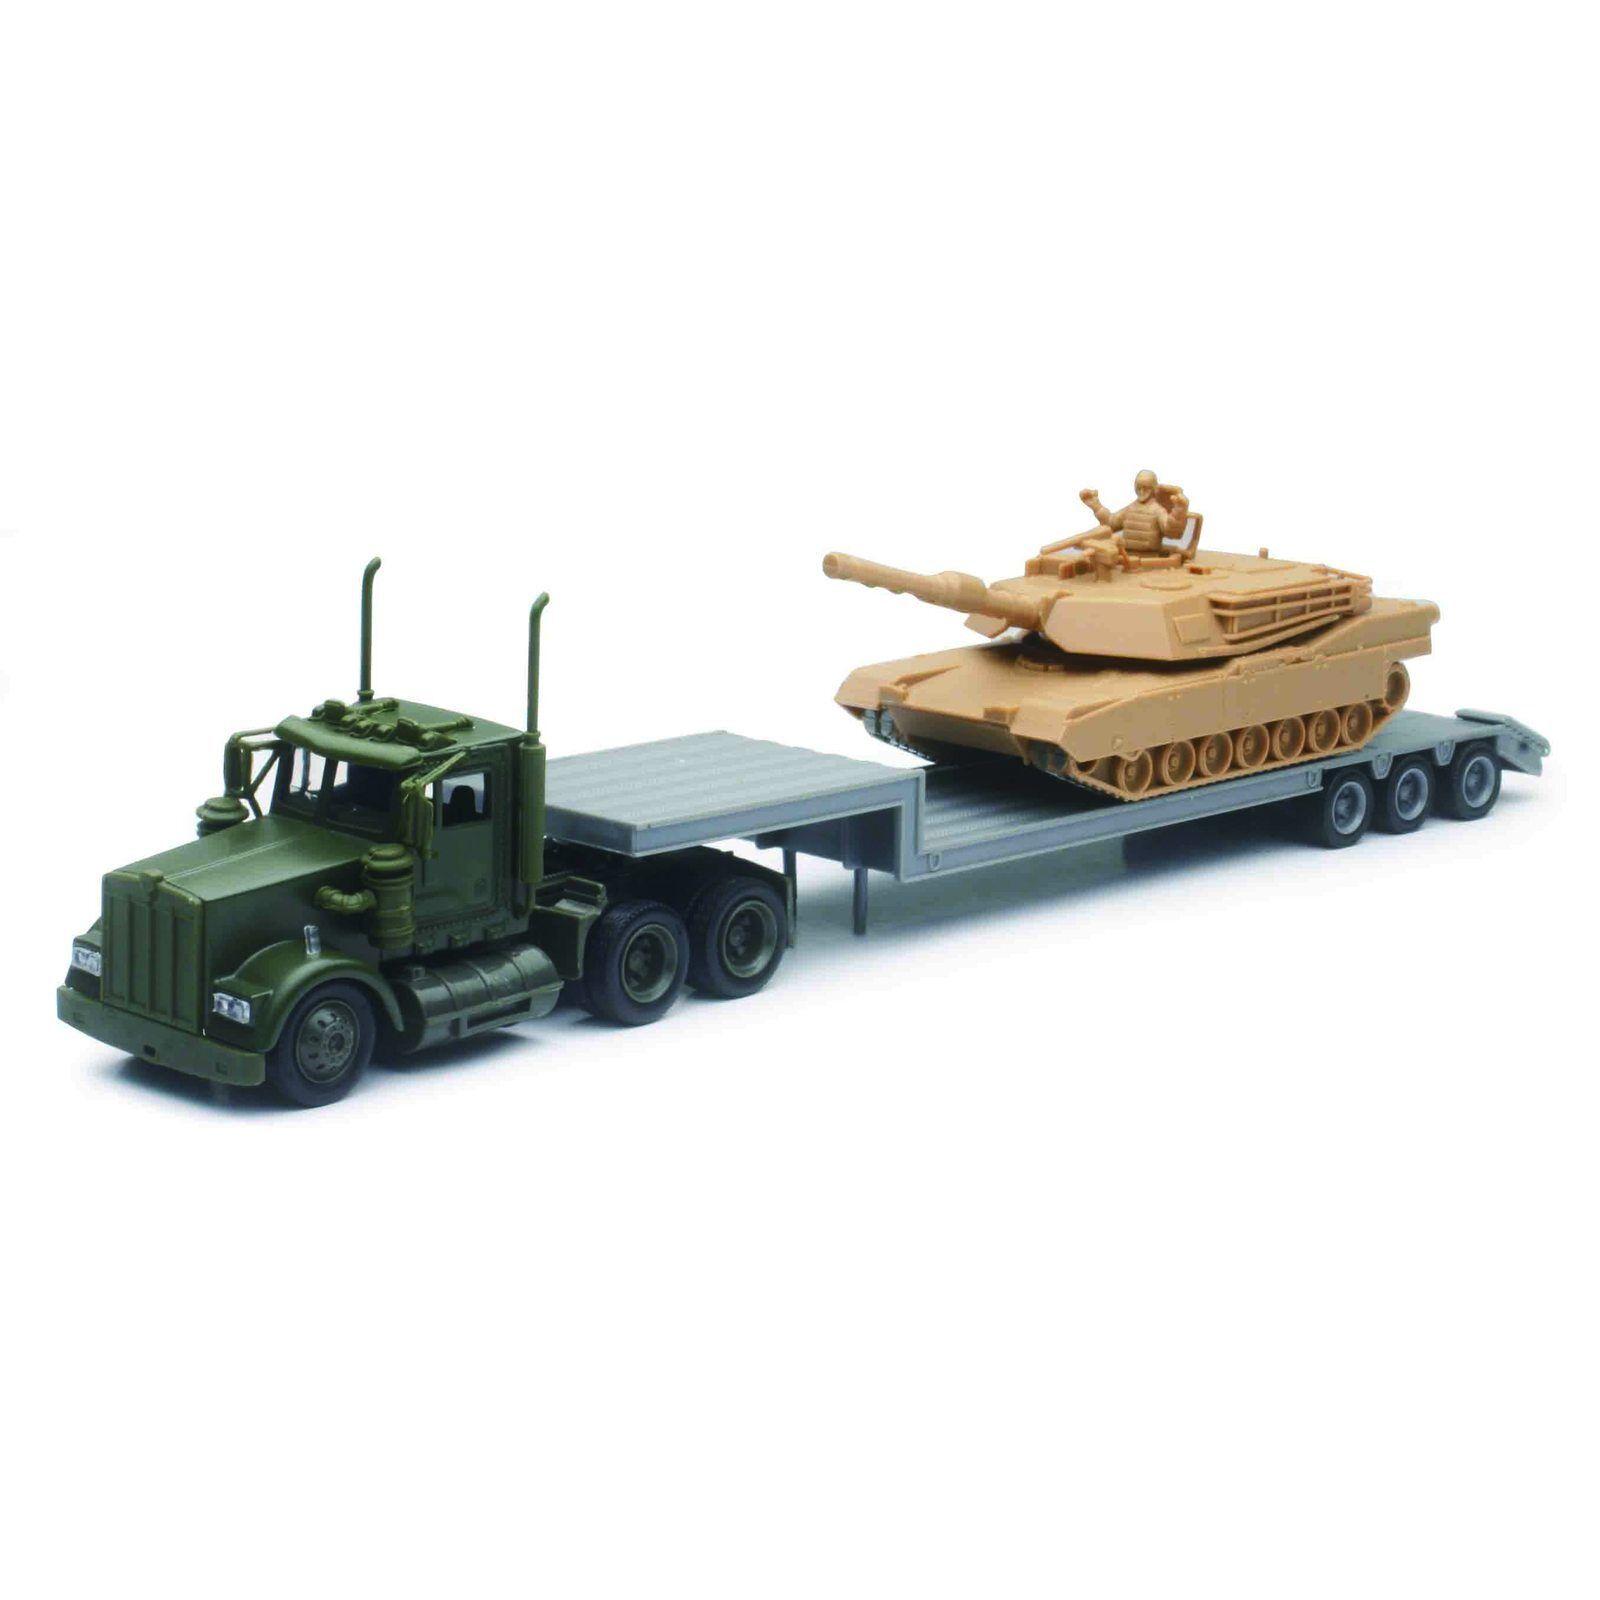 100% autentico KENWORTH KENWORTH KENWORTH W900 Panzer 1 43 + Camion militare missione  sconto online di vendita